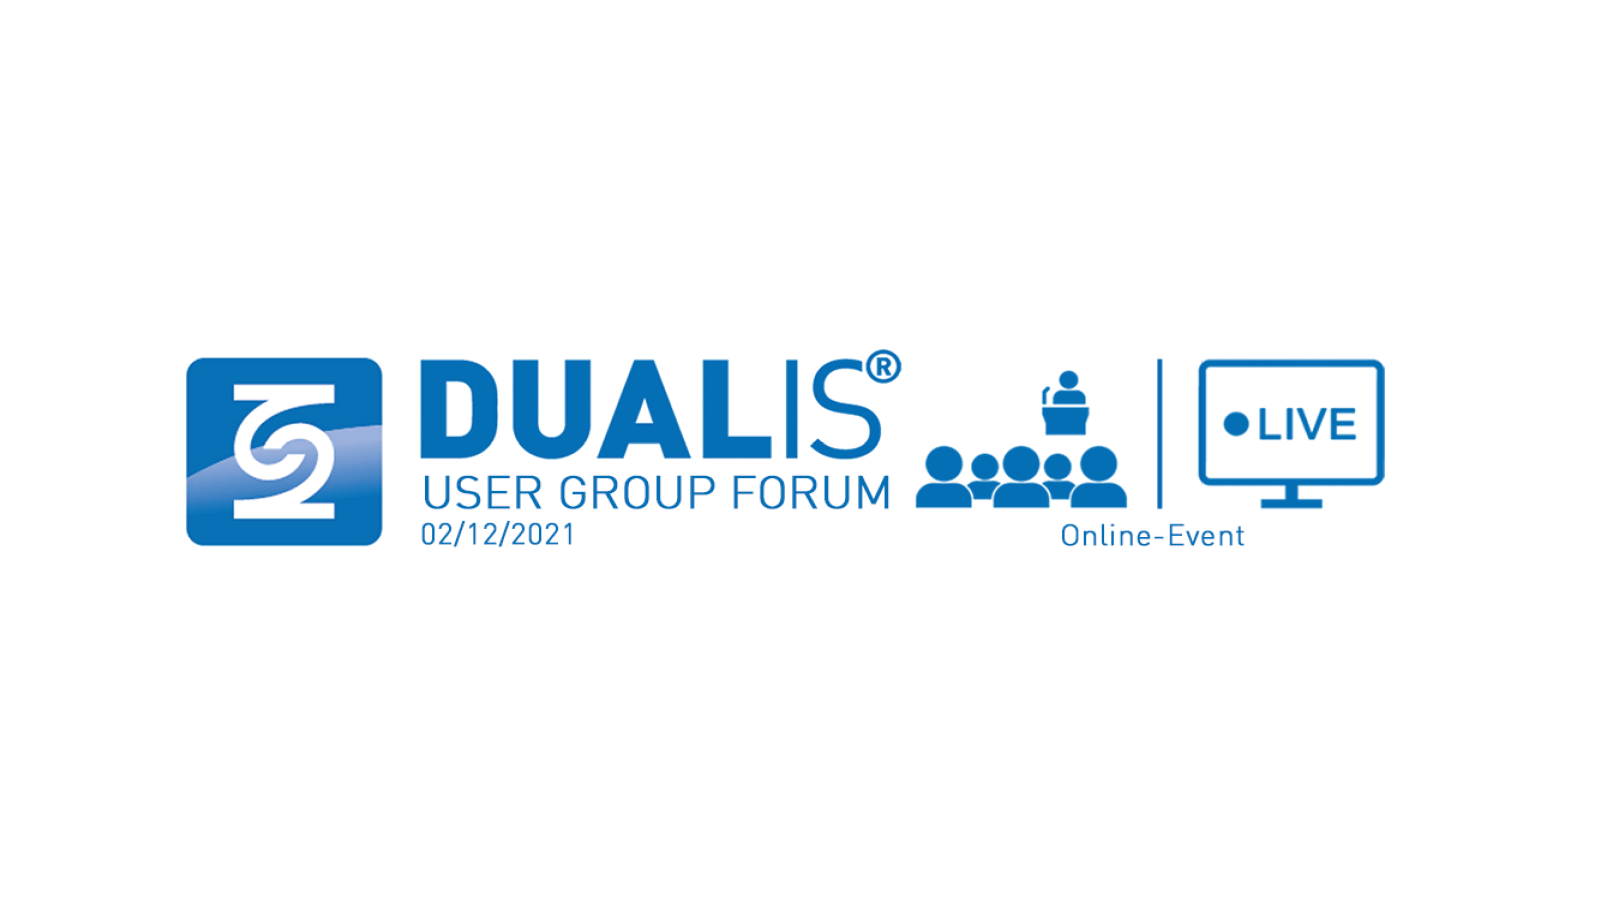 DUALIS User Group Forum 2021